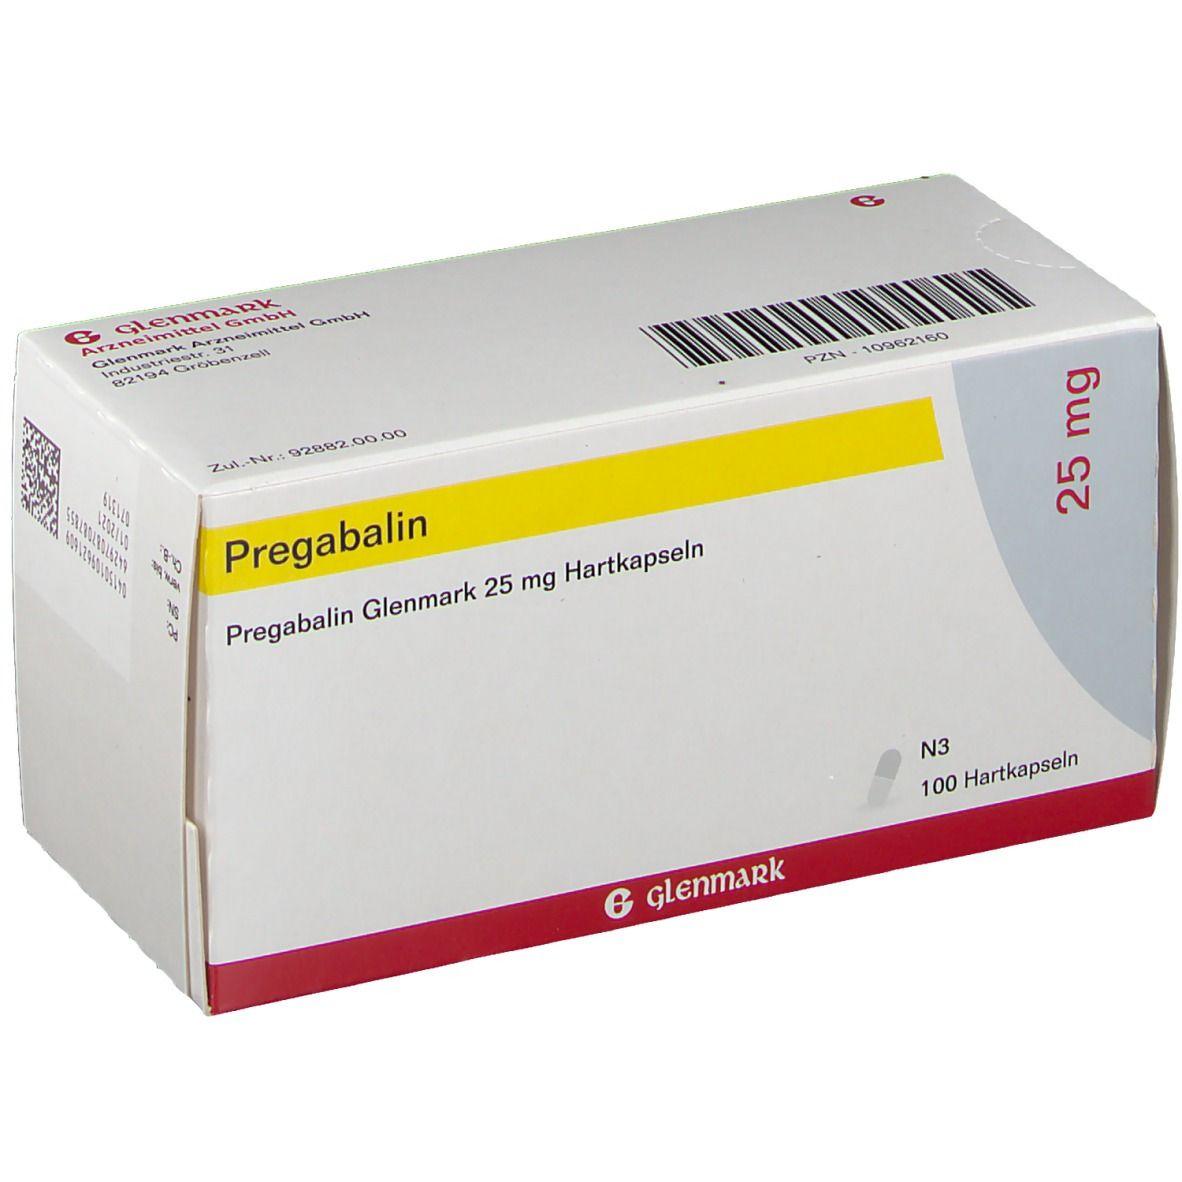 PREGABALIN Glenmark 25 mg Hartkapseln